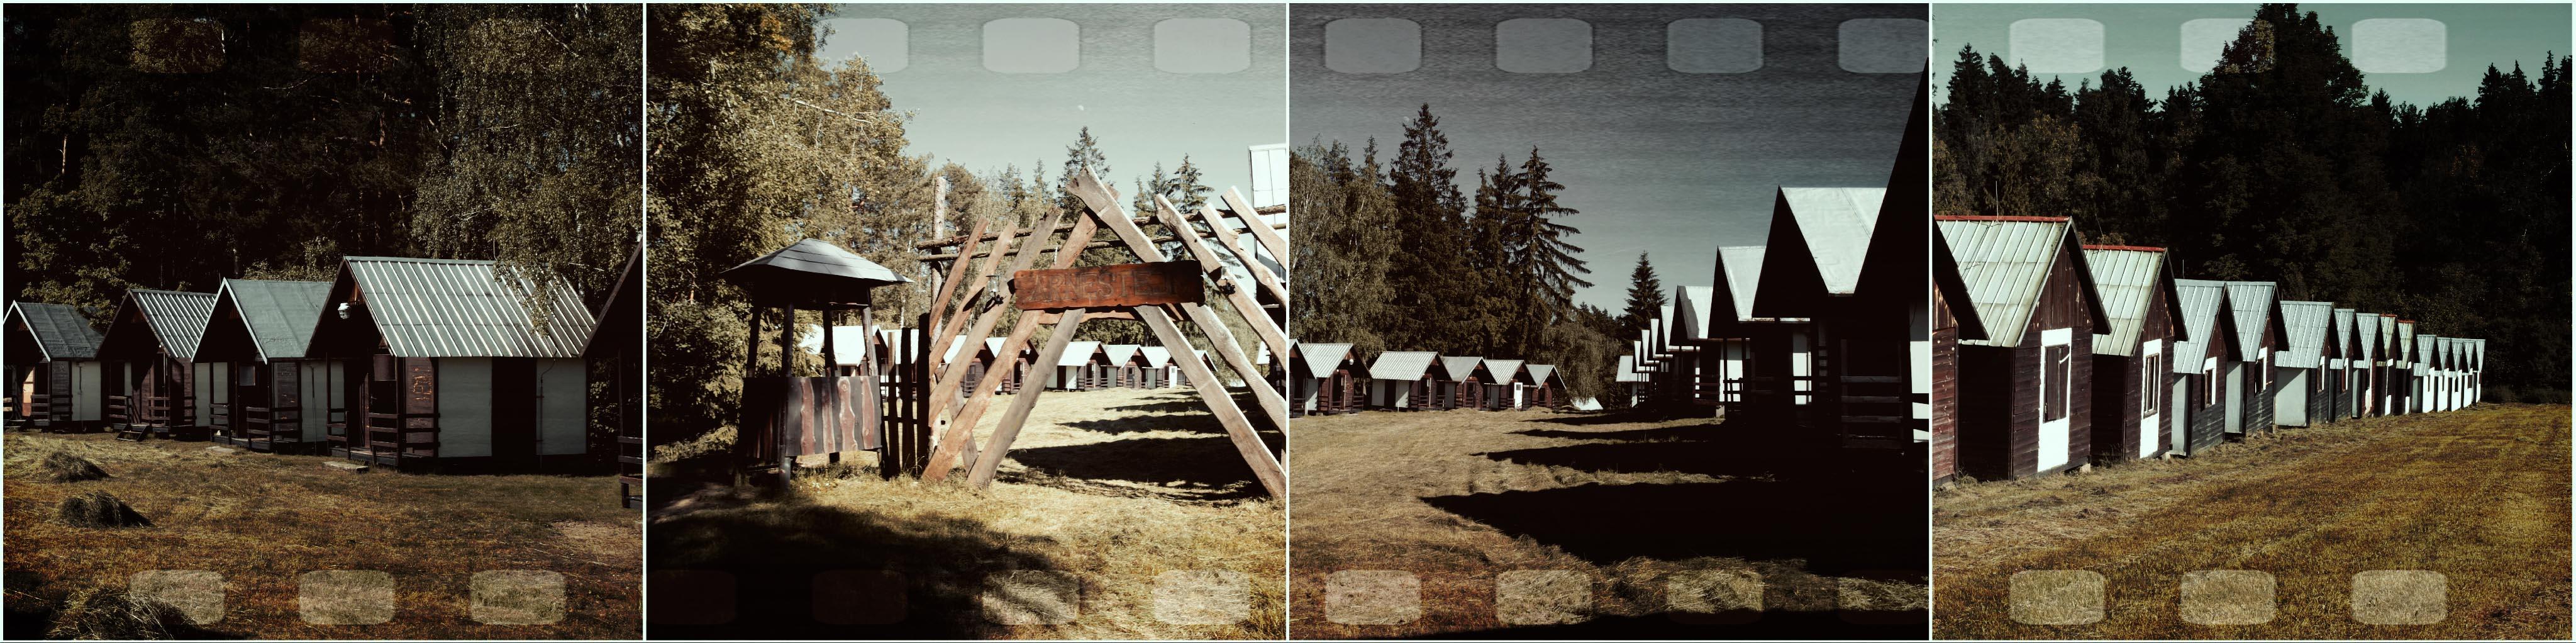 arnestovicky_tabor